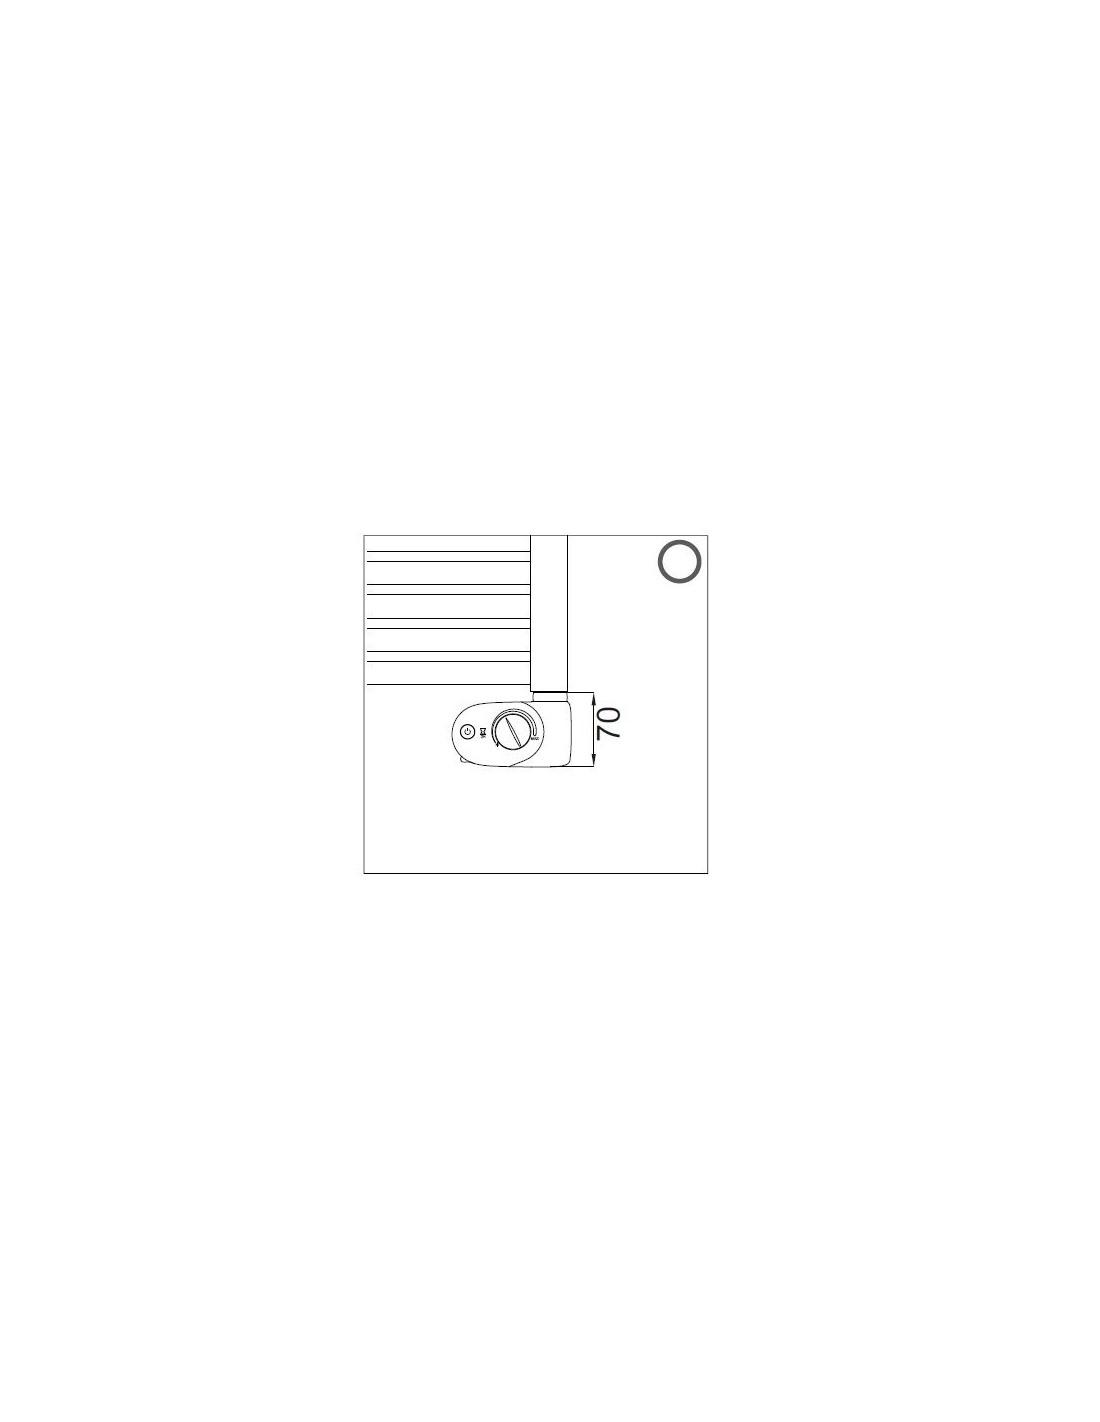 sch ma s che serviettes lisa 2 lectrique chrom 750w. Black Bedroom Furniture Sets. Home Design Ideas